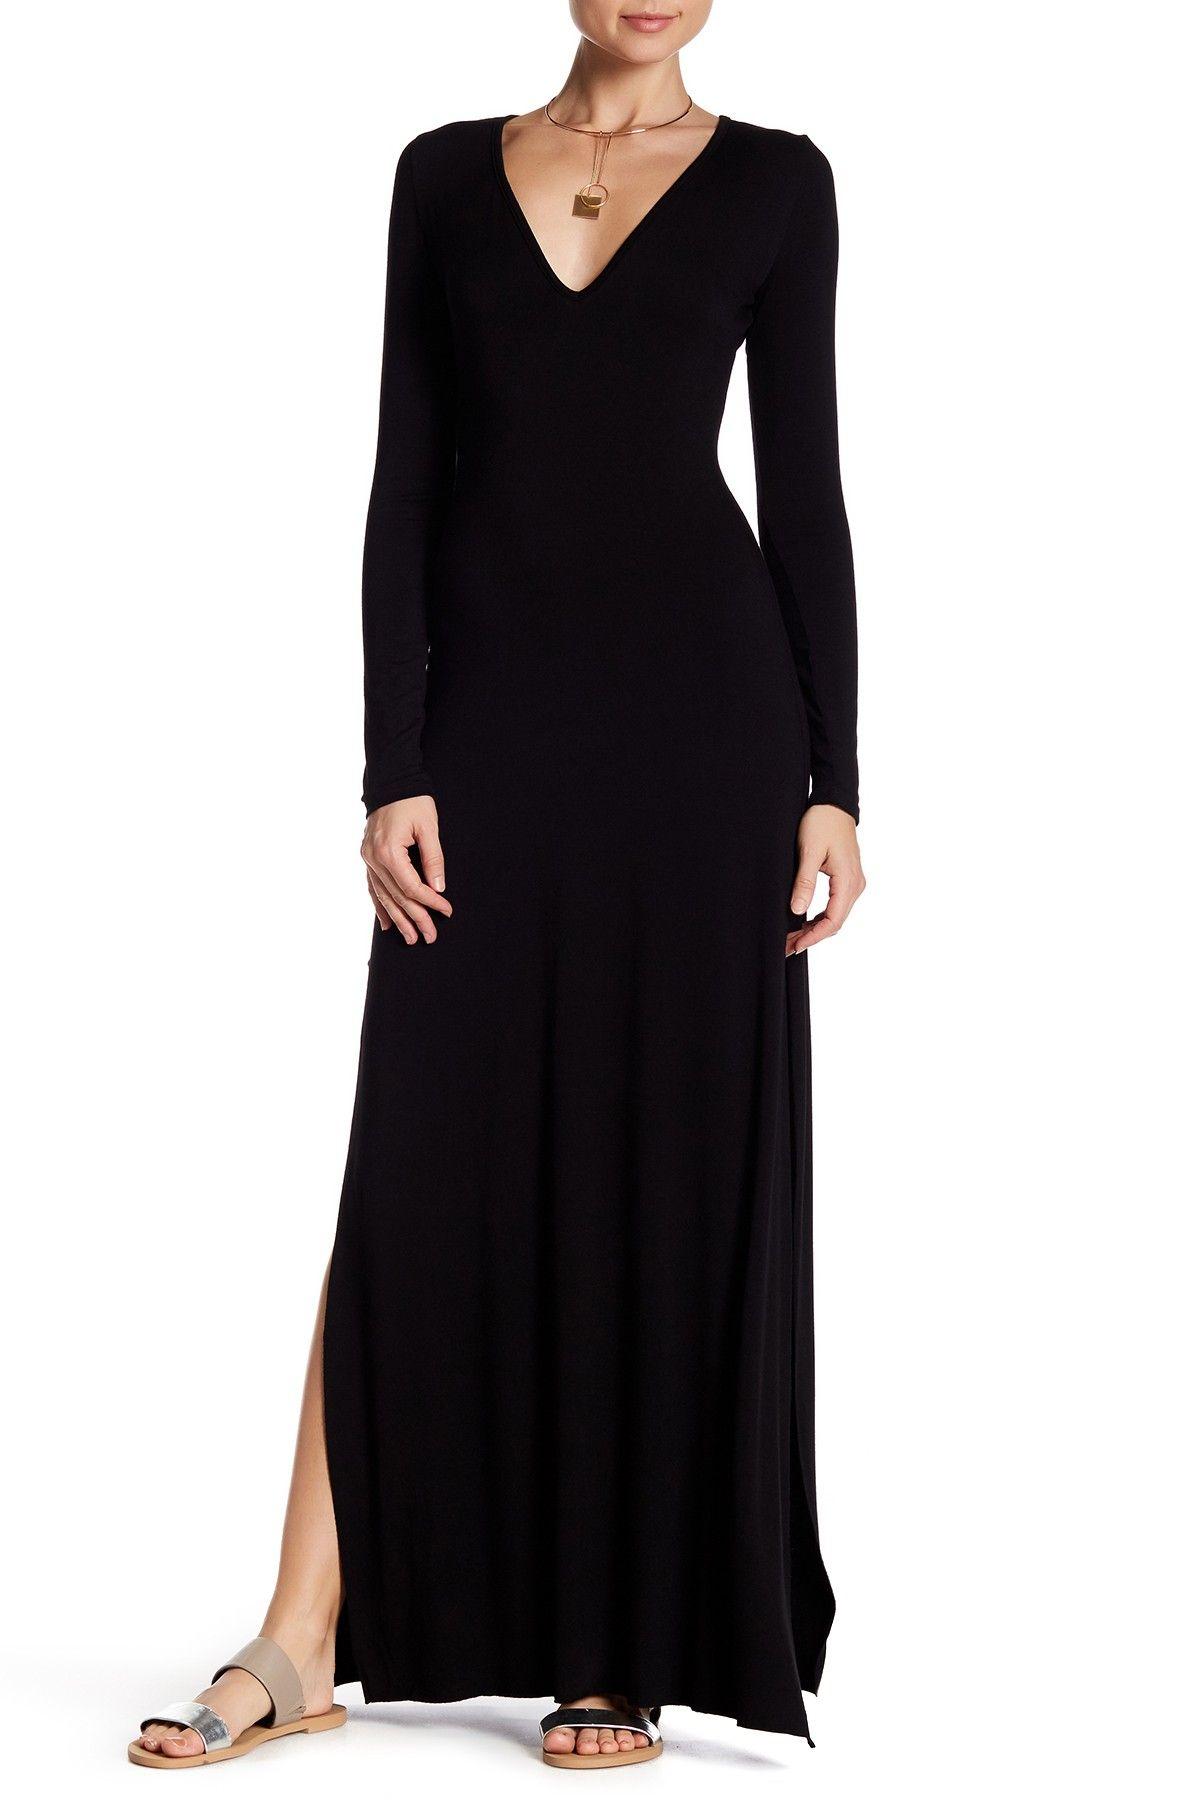 Clayton stevie long sleeve vneck maxi dress womens fashion street